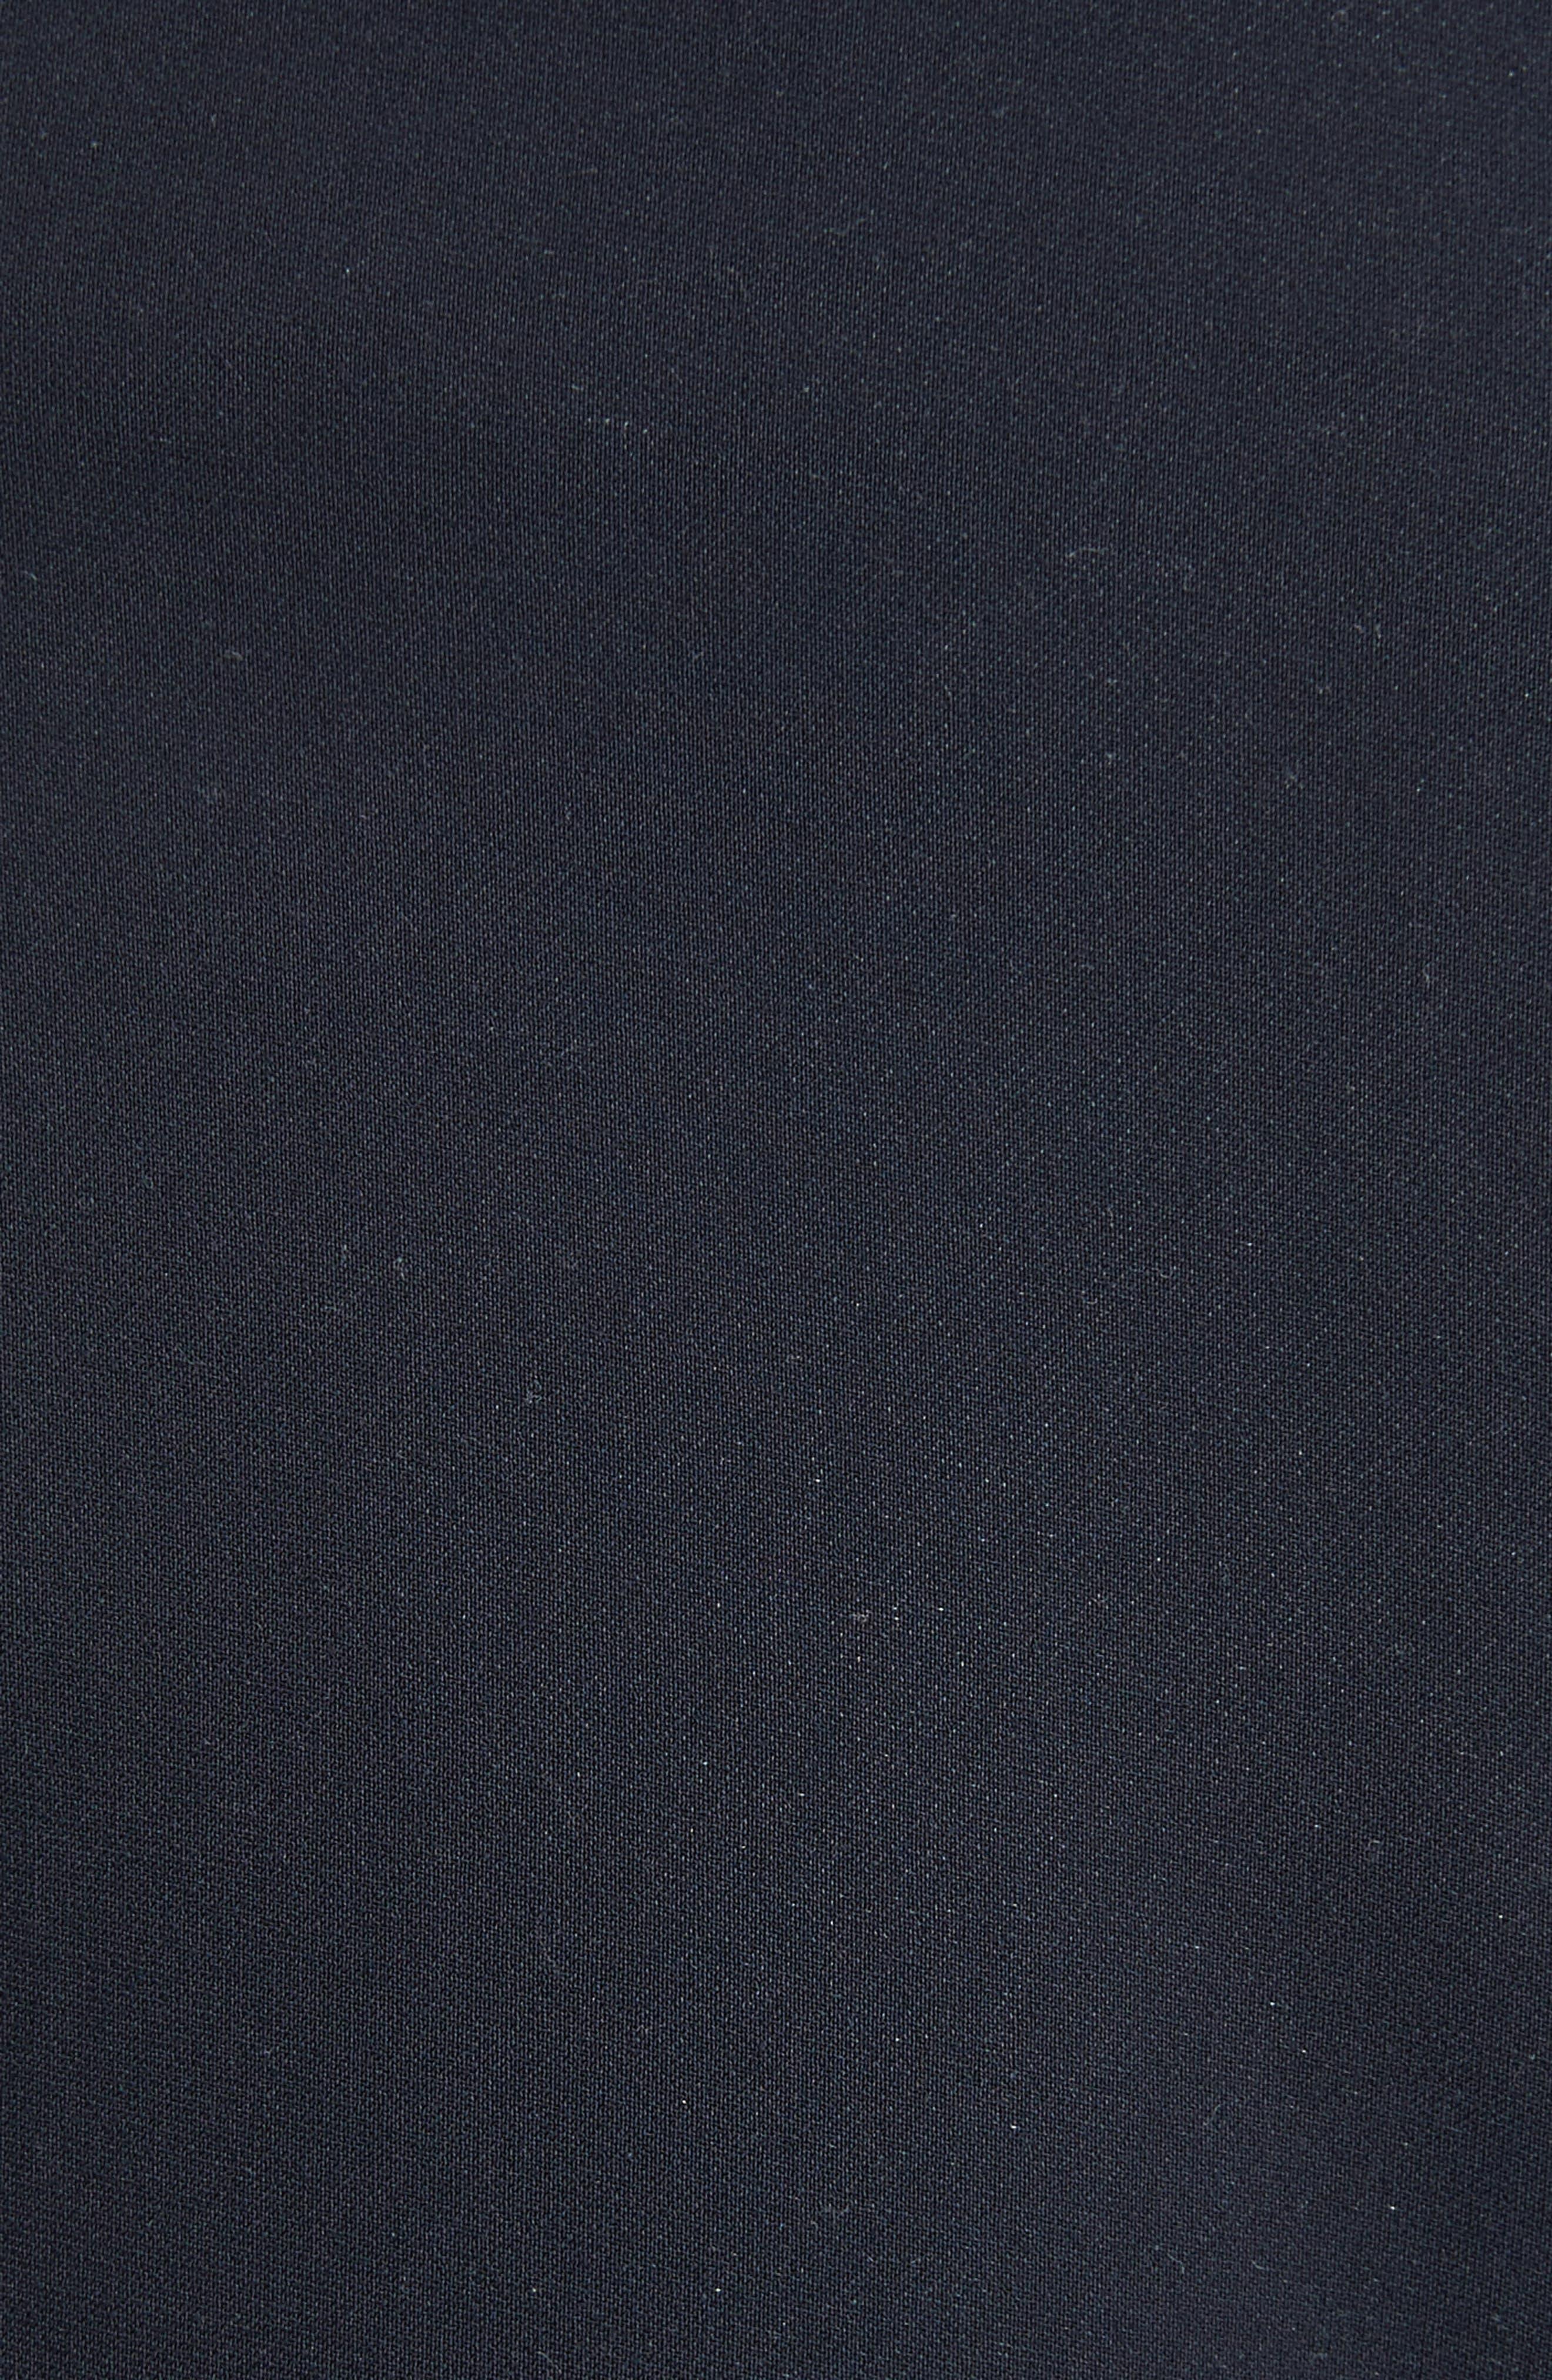 Ruffle Apron Shorts,                             Alternate thumbnail 5, color,                             Midnight